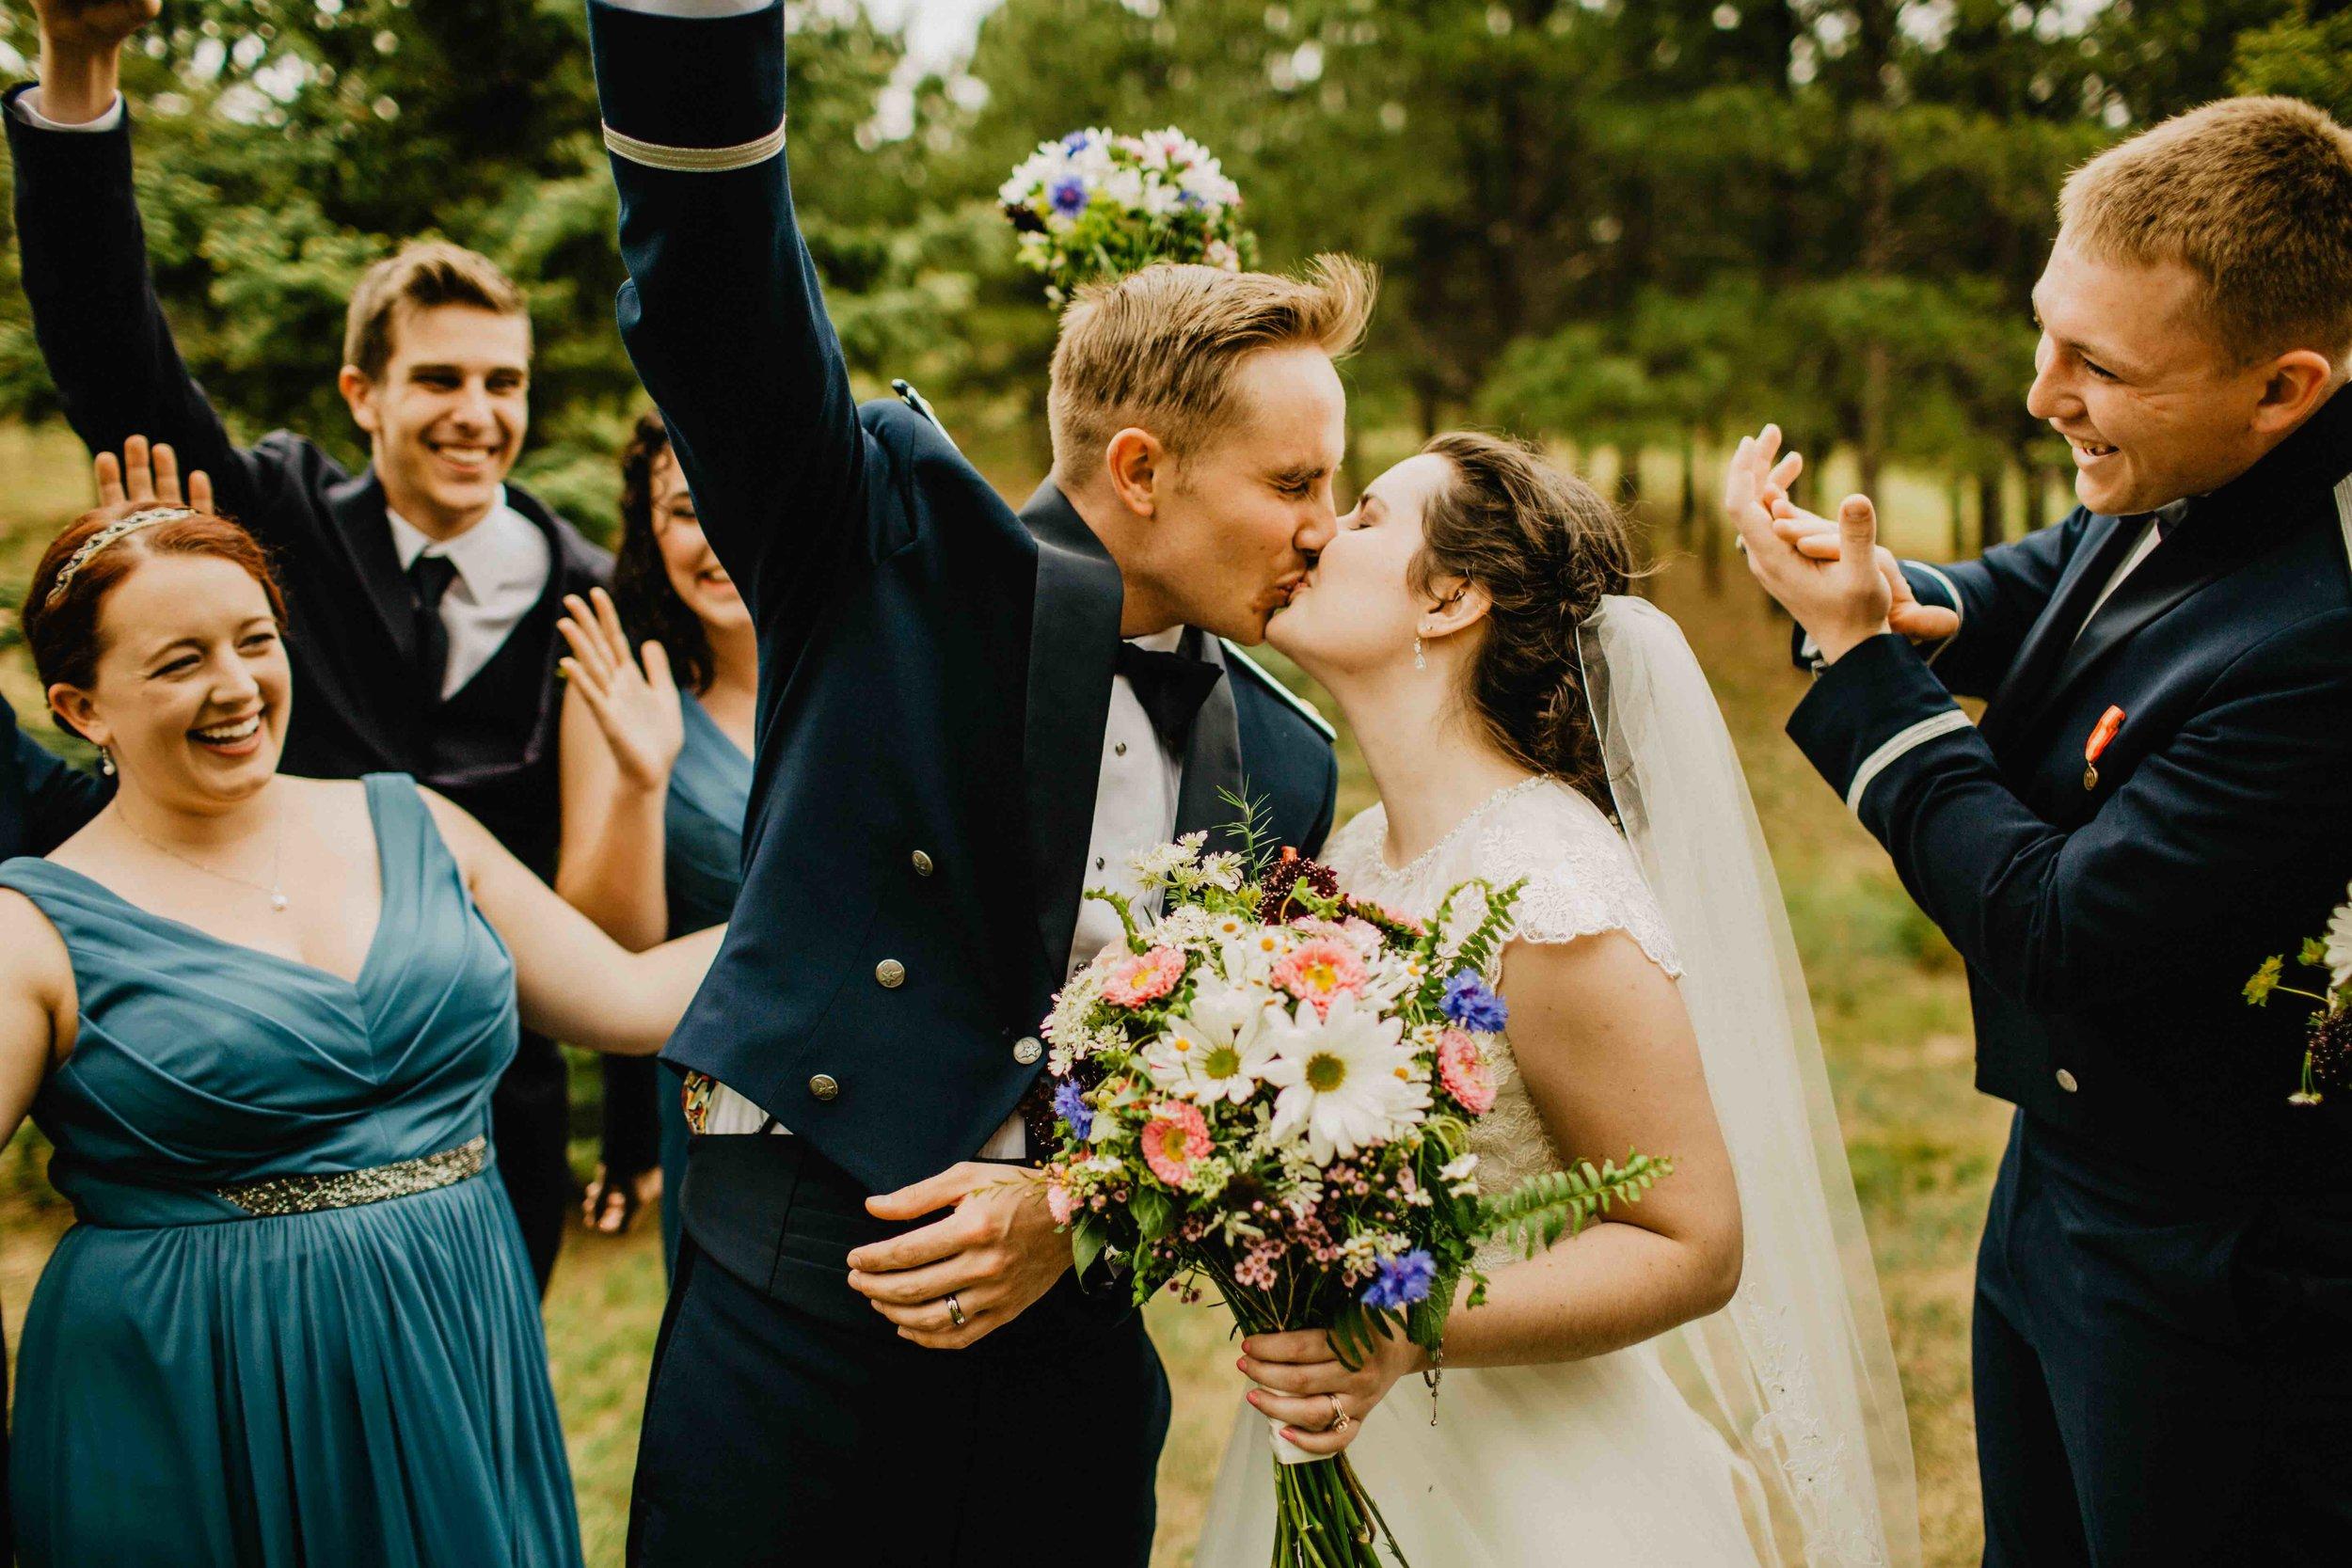 607A5904-colorado-wedding-photographer-denver-springs-vail--colorado-wedding-photographer-denver-springs-vail-.jpeg